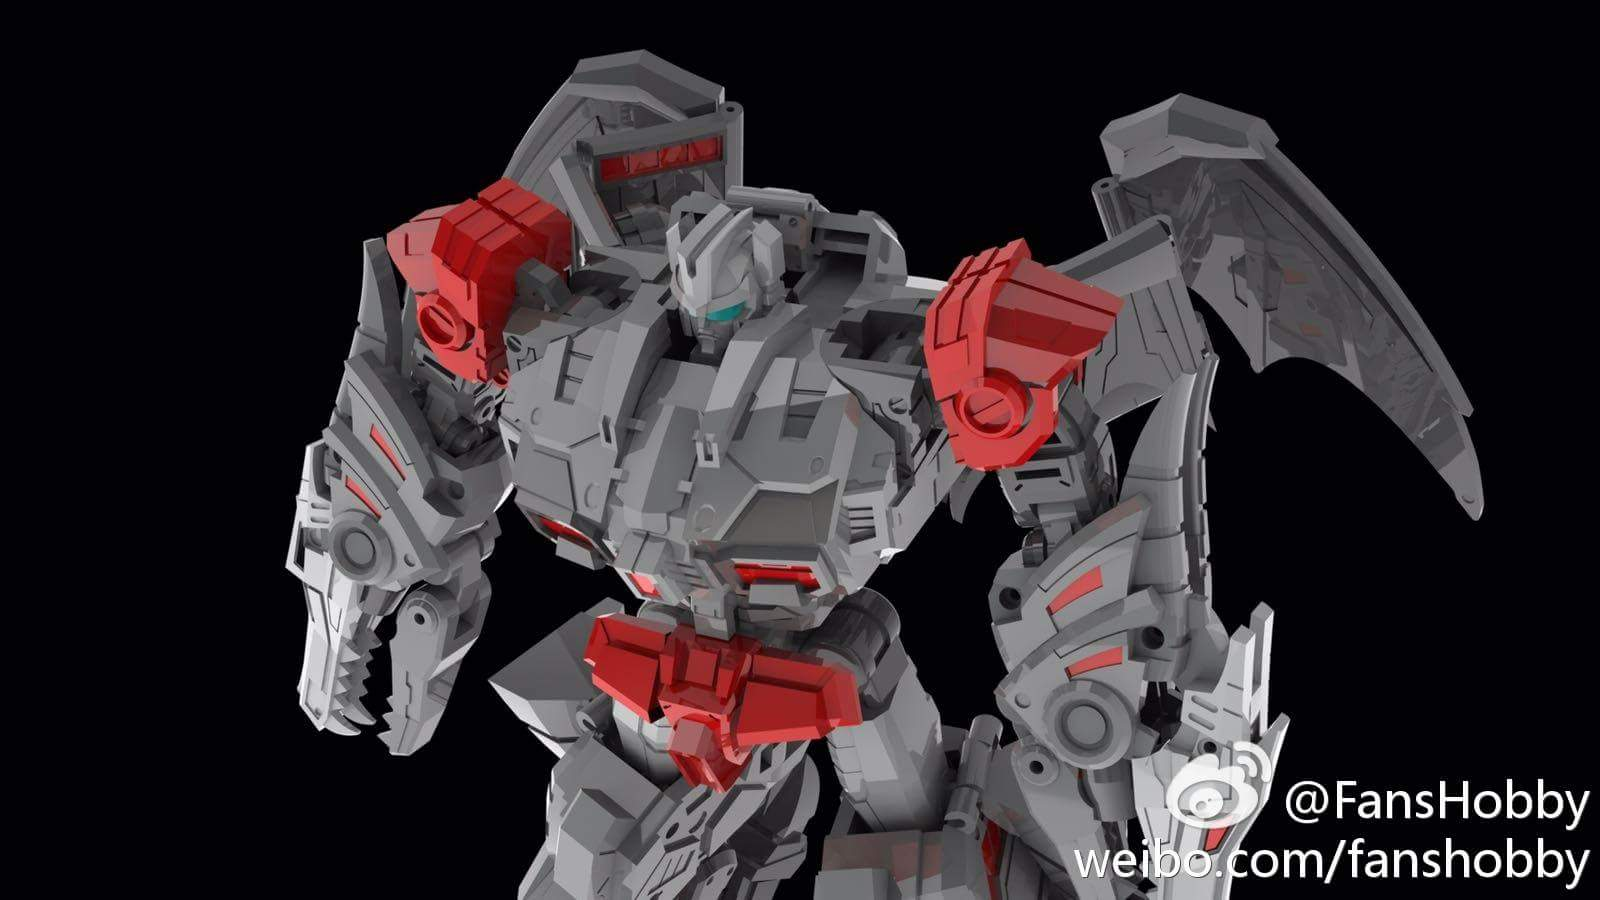 [FansHobby] Produit Tiers - Master Builder MB-02/03/05 - aka Monsterbots/Monstrebots - Page 2 Rcx628rB